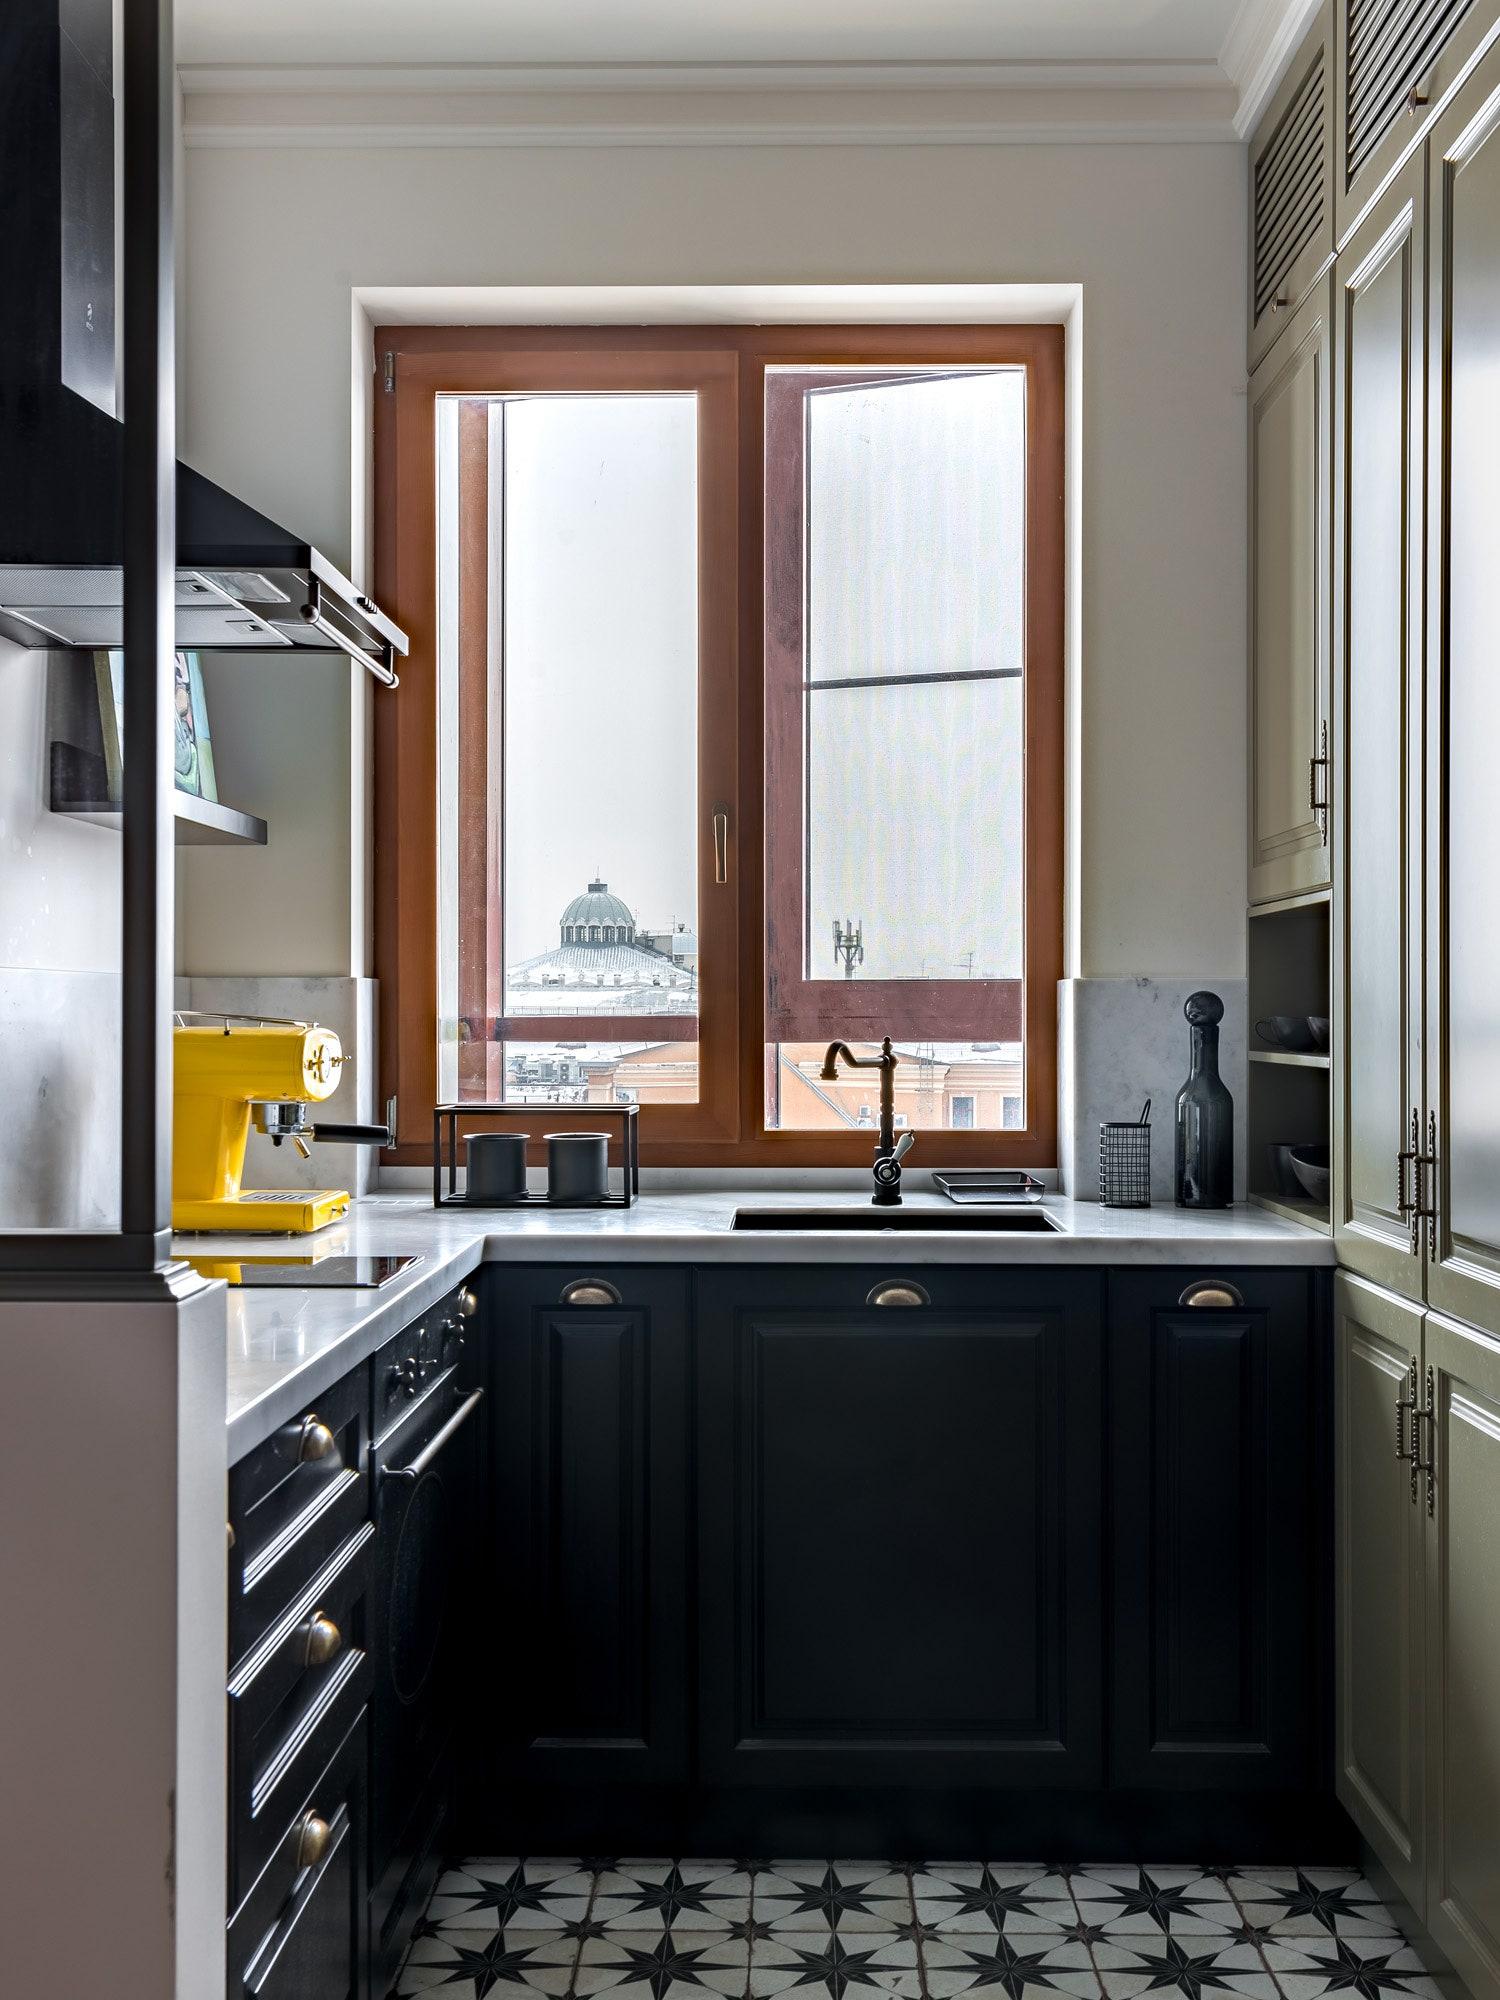 .       Virstak Design  IKEA  Elica  Brass  Francis Francis X1  HampM  Little Green  Peronda.